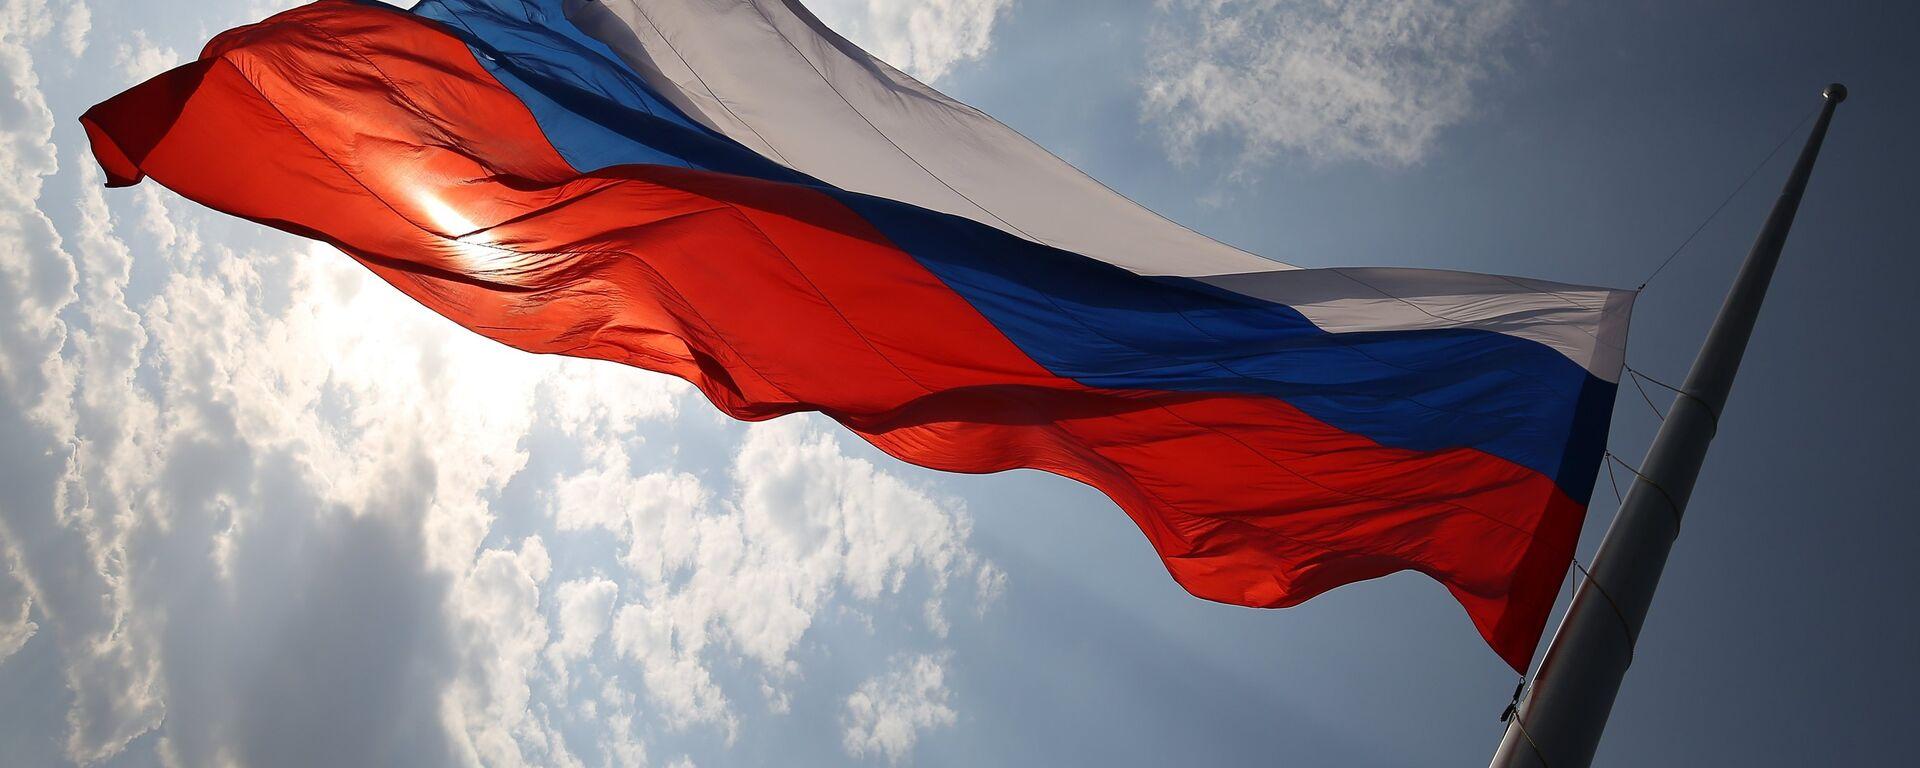 Bandera de Rusia (imagen referencial) - Sputnik Mundo, 1920, 02.07.2021